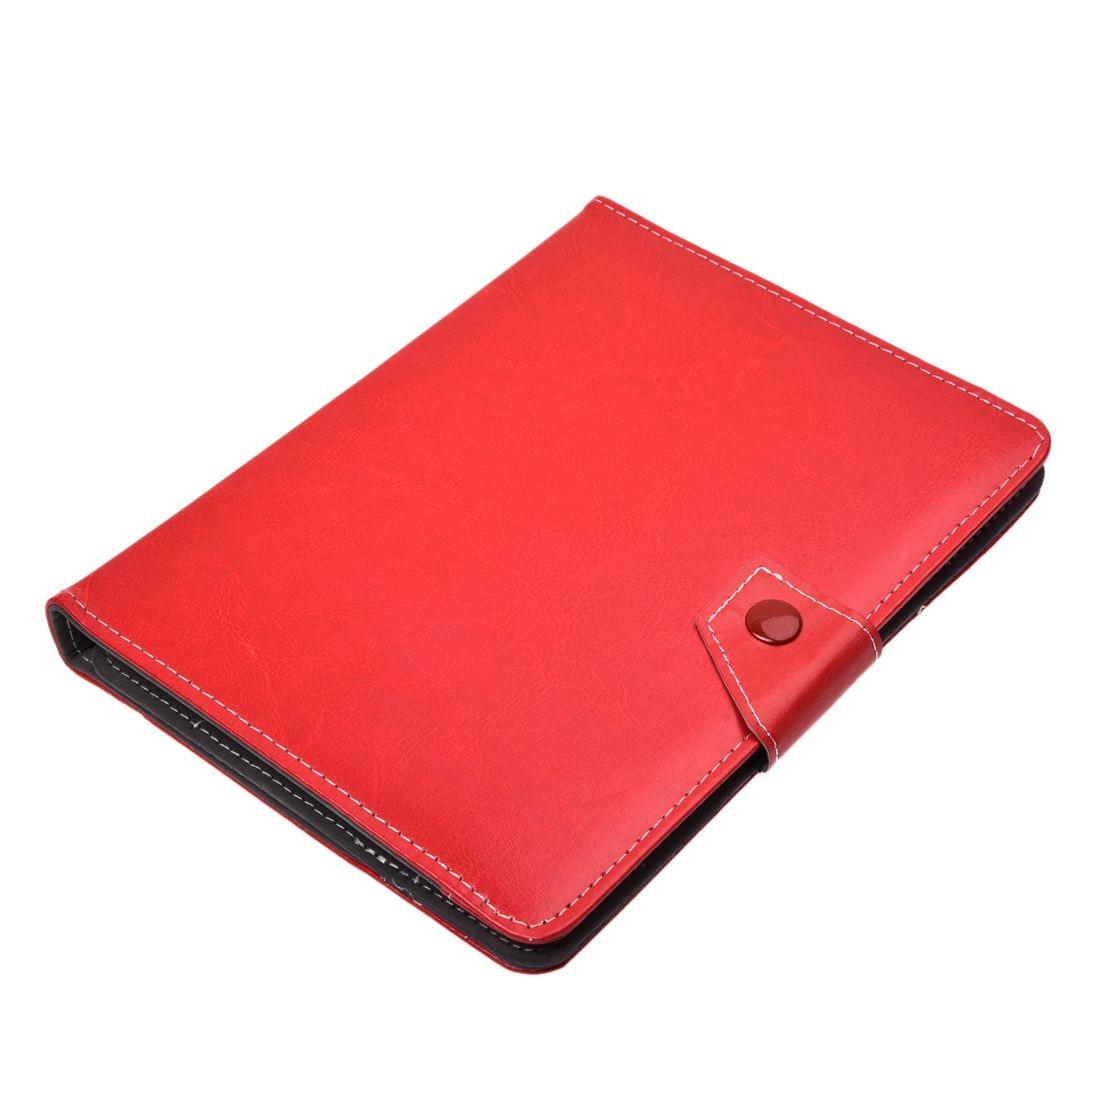 8 Inch Universal Tablet PC Case Crystal PU Leather Support Case планшет модель g15 gpad tablet pc в донецке недорого